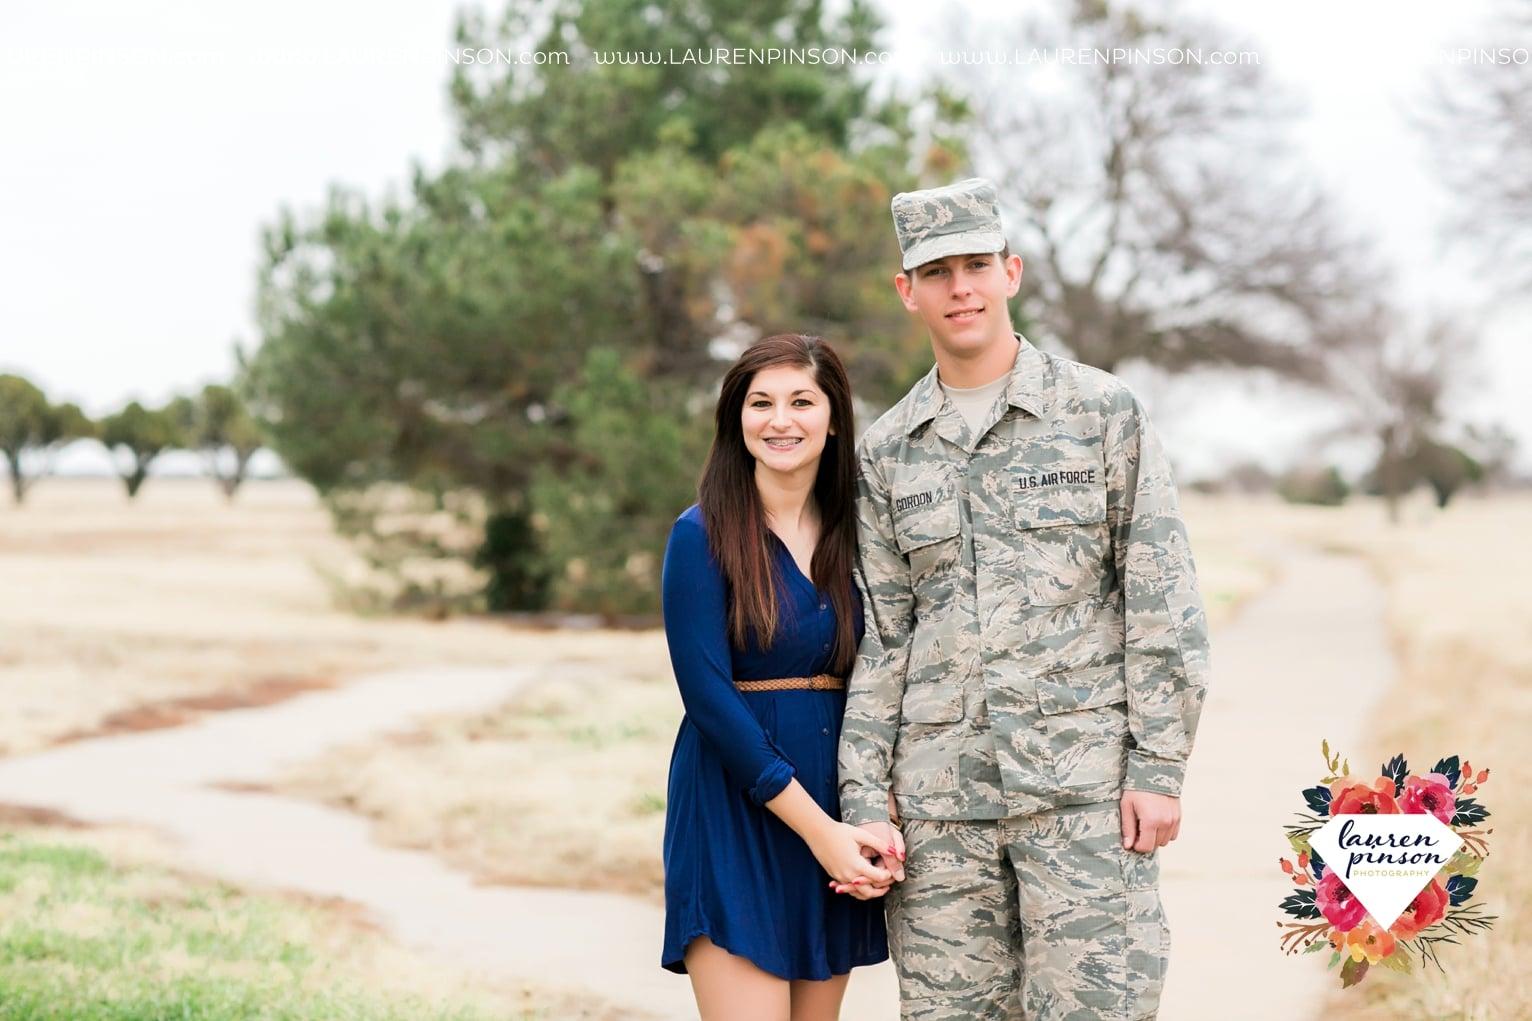 sheppard-afb-wichita-falls-engagement-session-airmen-in-uniform-abu-airplanes-bride-engagement-ring-texas-air-force-base_1996.jpg